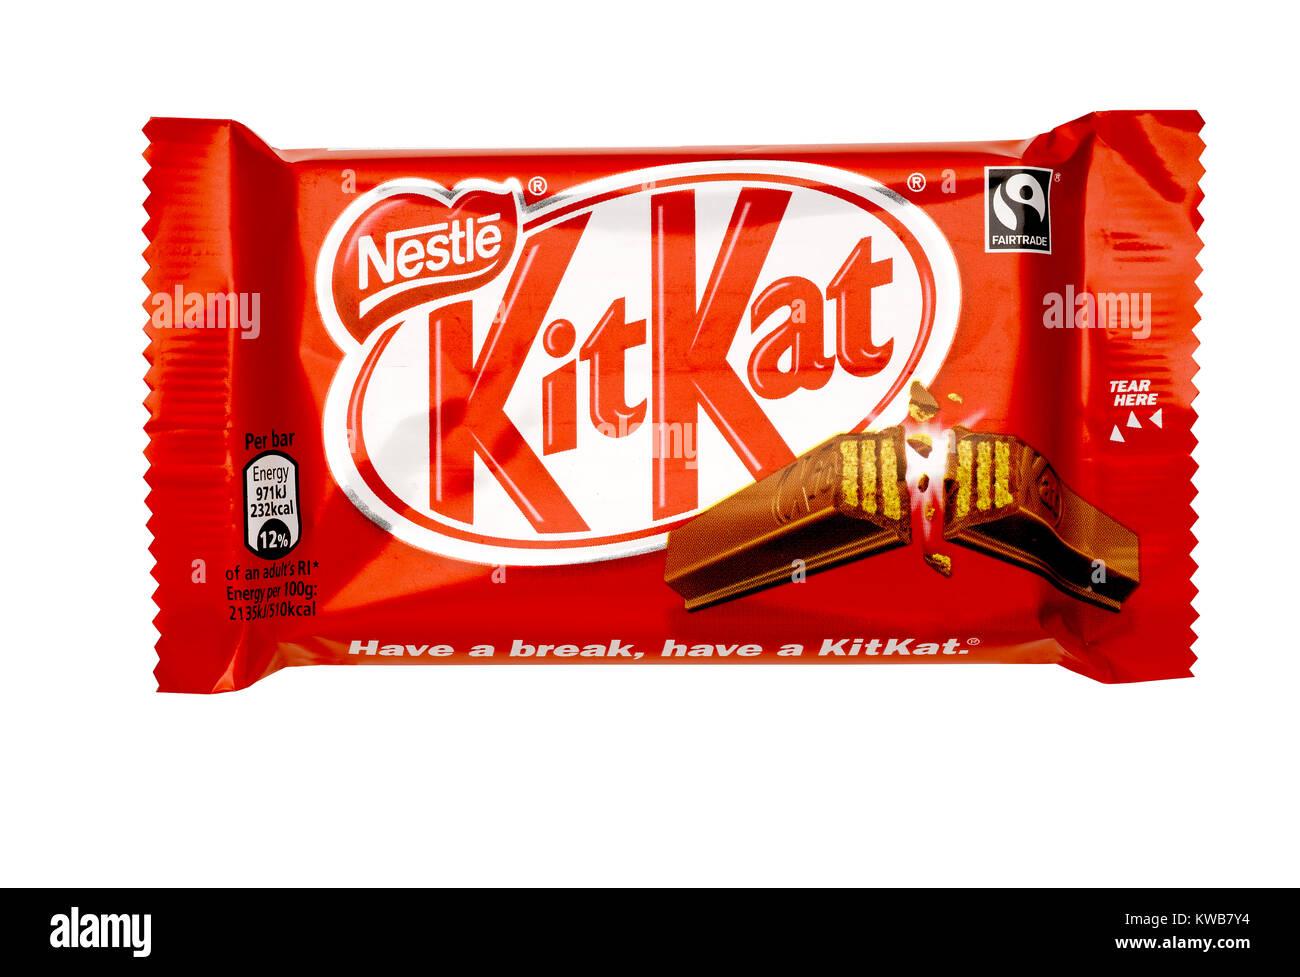 A cut out shot of a chocolate Kit Kat - Stock Image